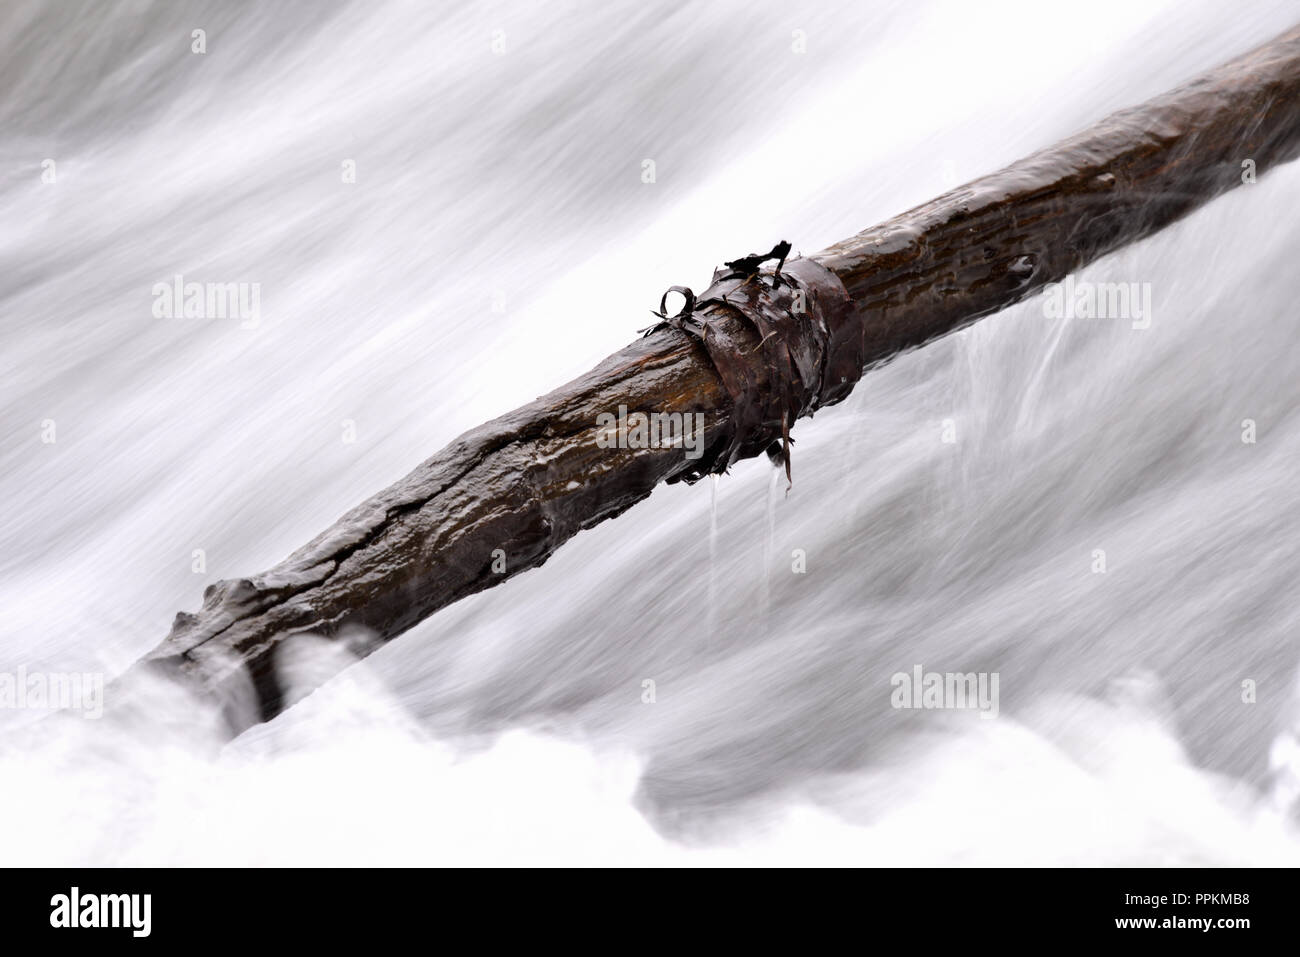 Leben und Tod - Ein sterbender Ast im lebendigen Wasser (life and death - A dying branch in the living water) - Stock Image